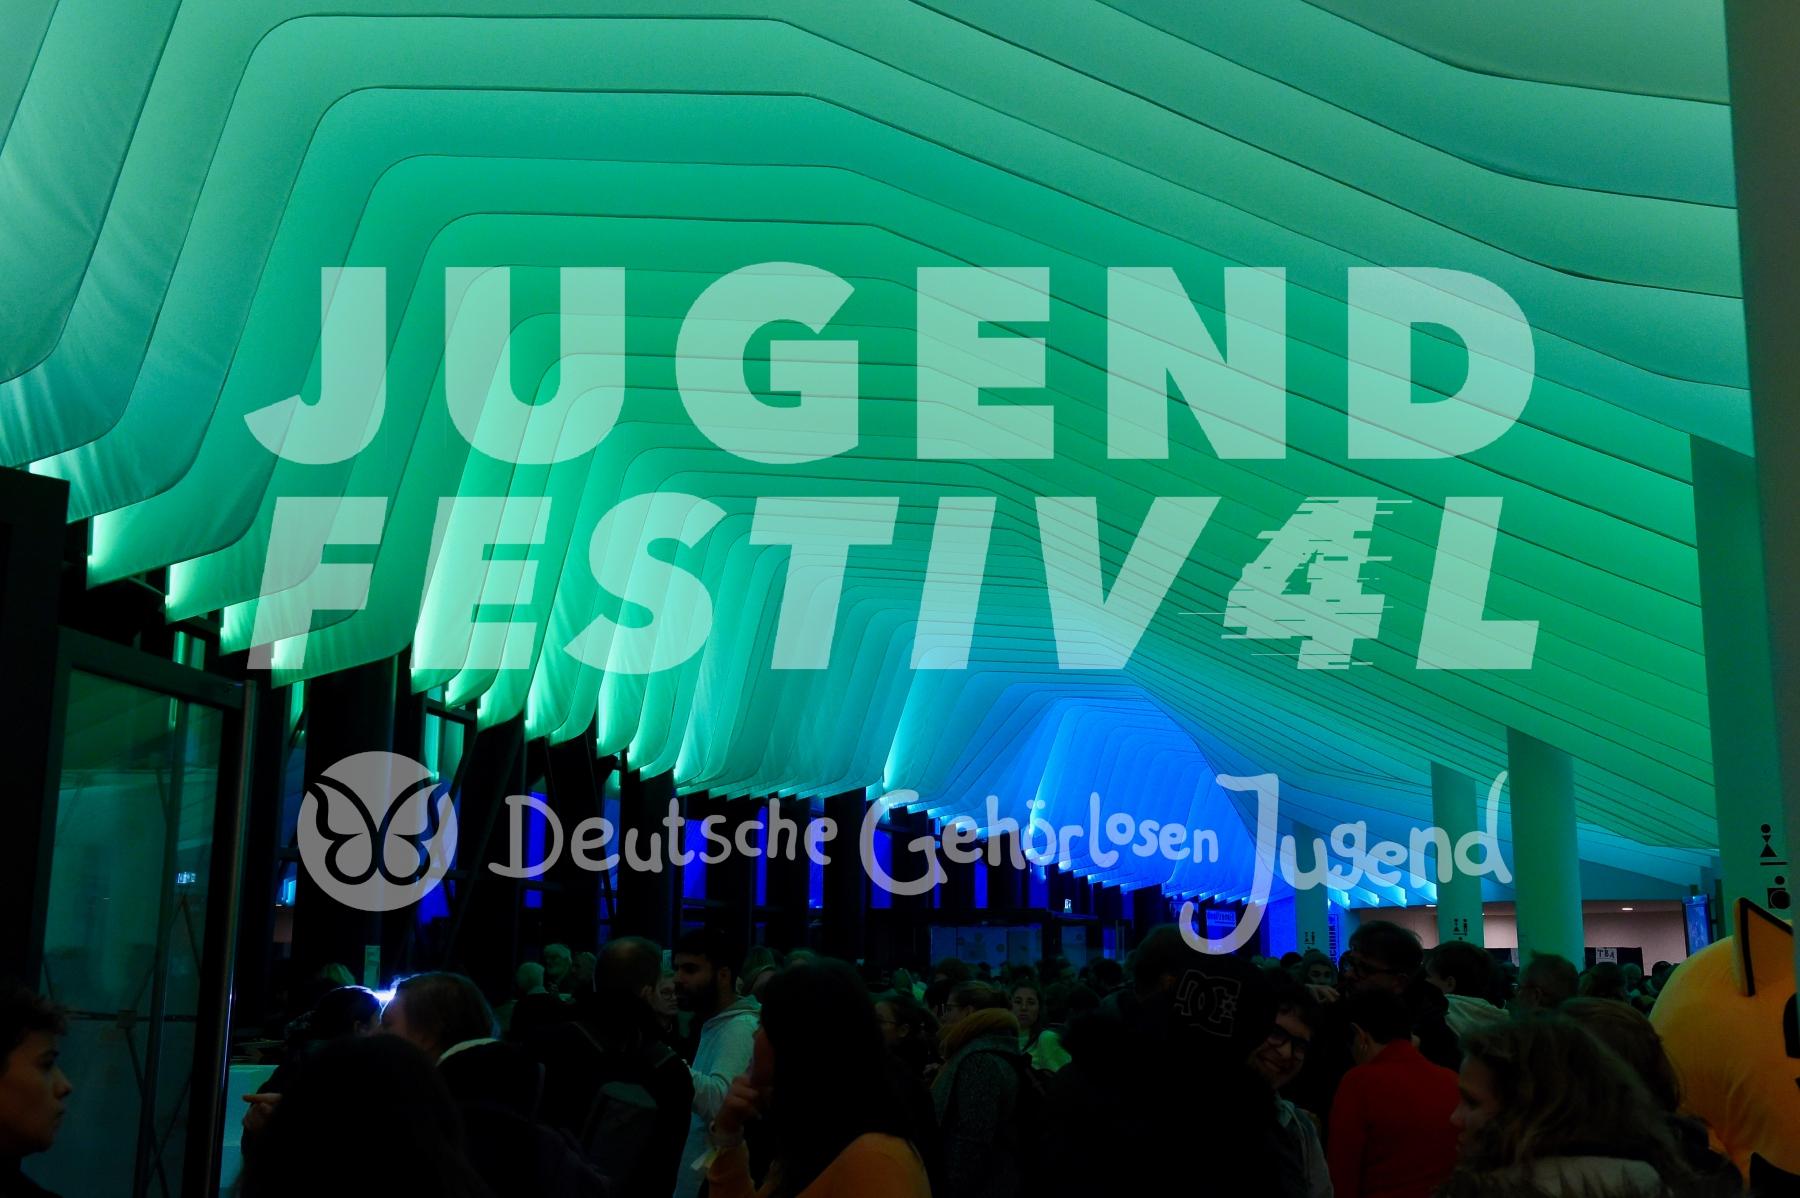 Jugendfestiv4l-108